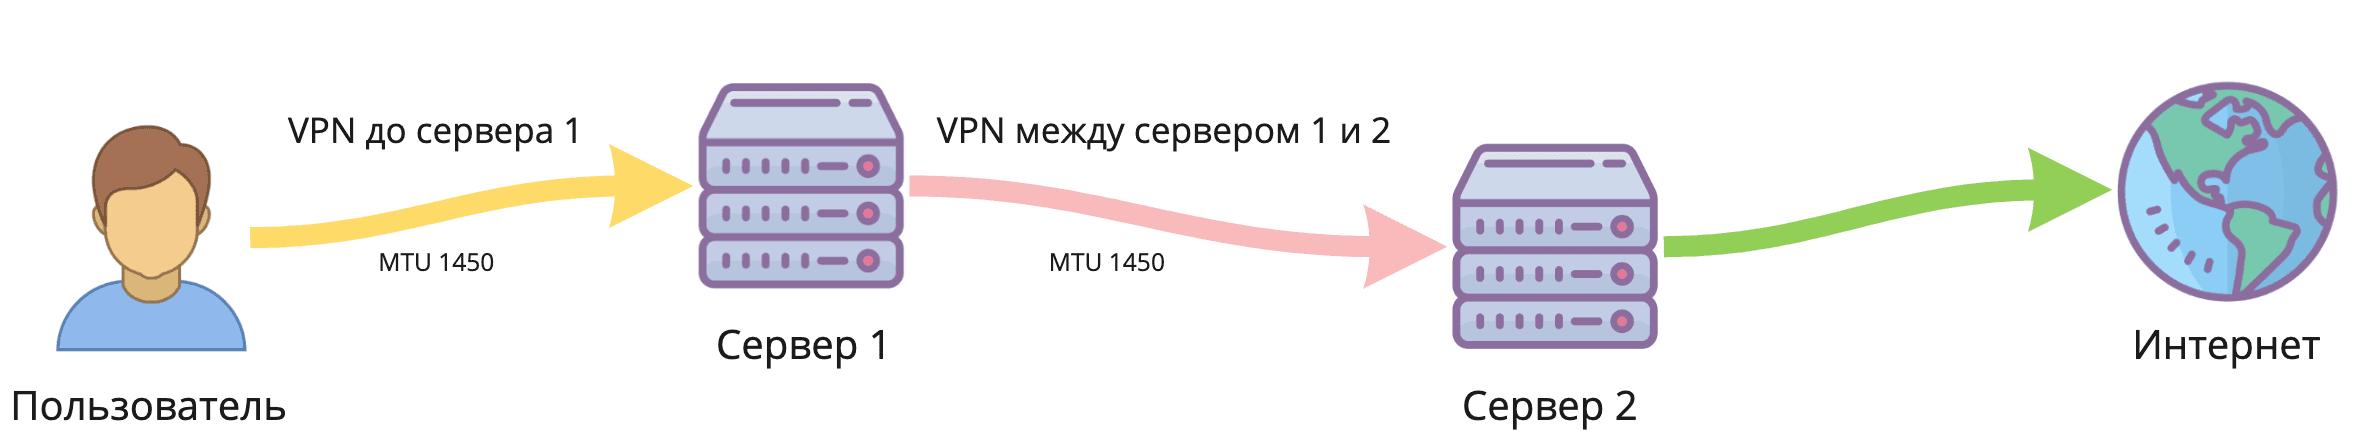 Double VPN или двойной VPN